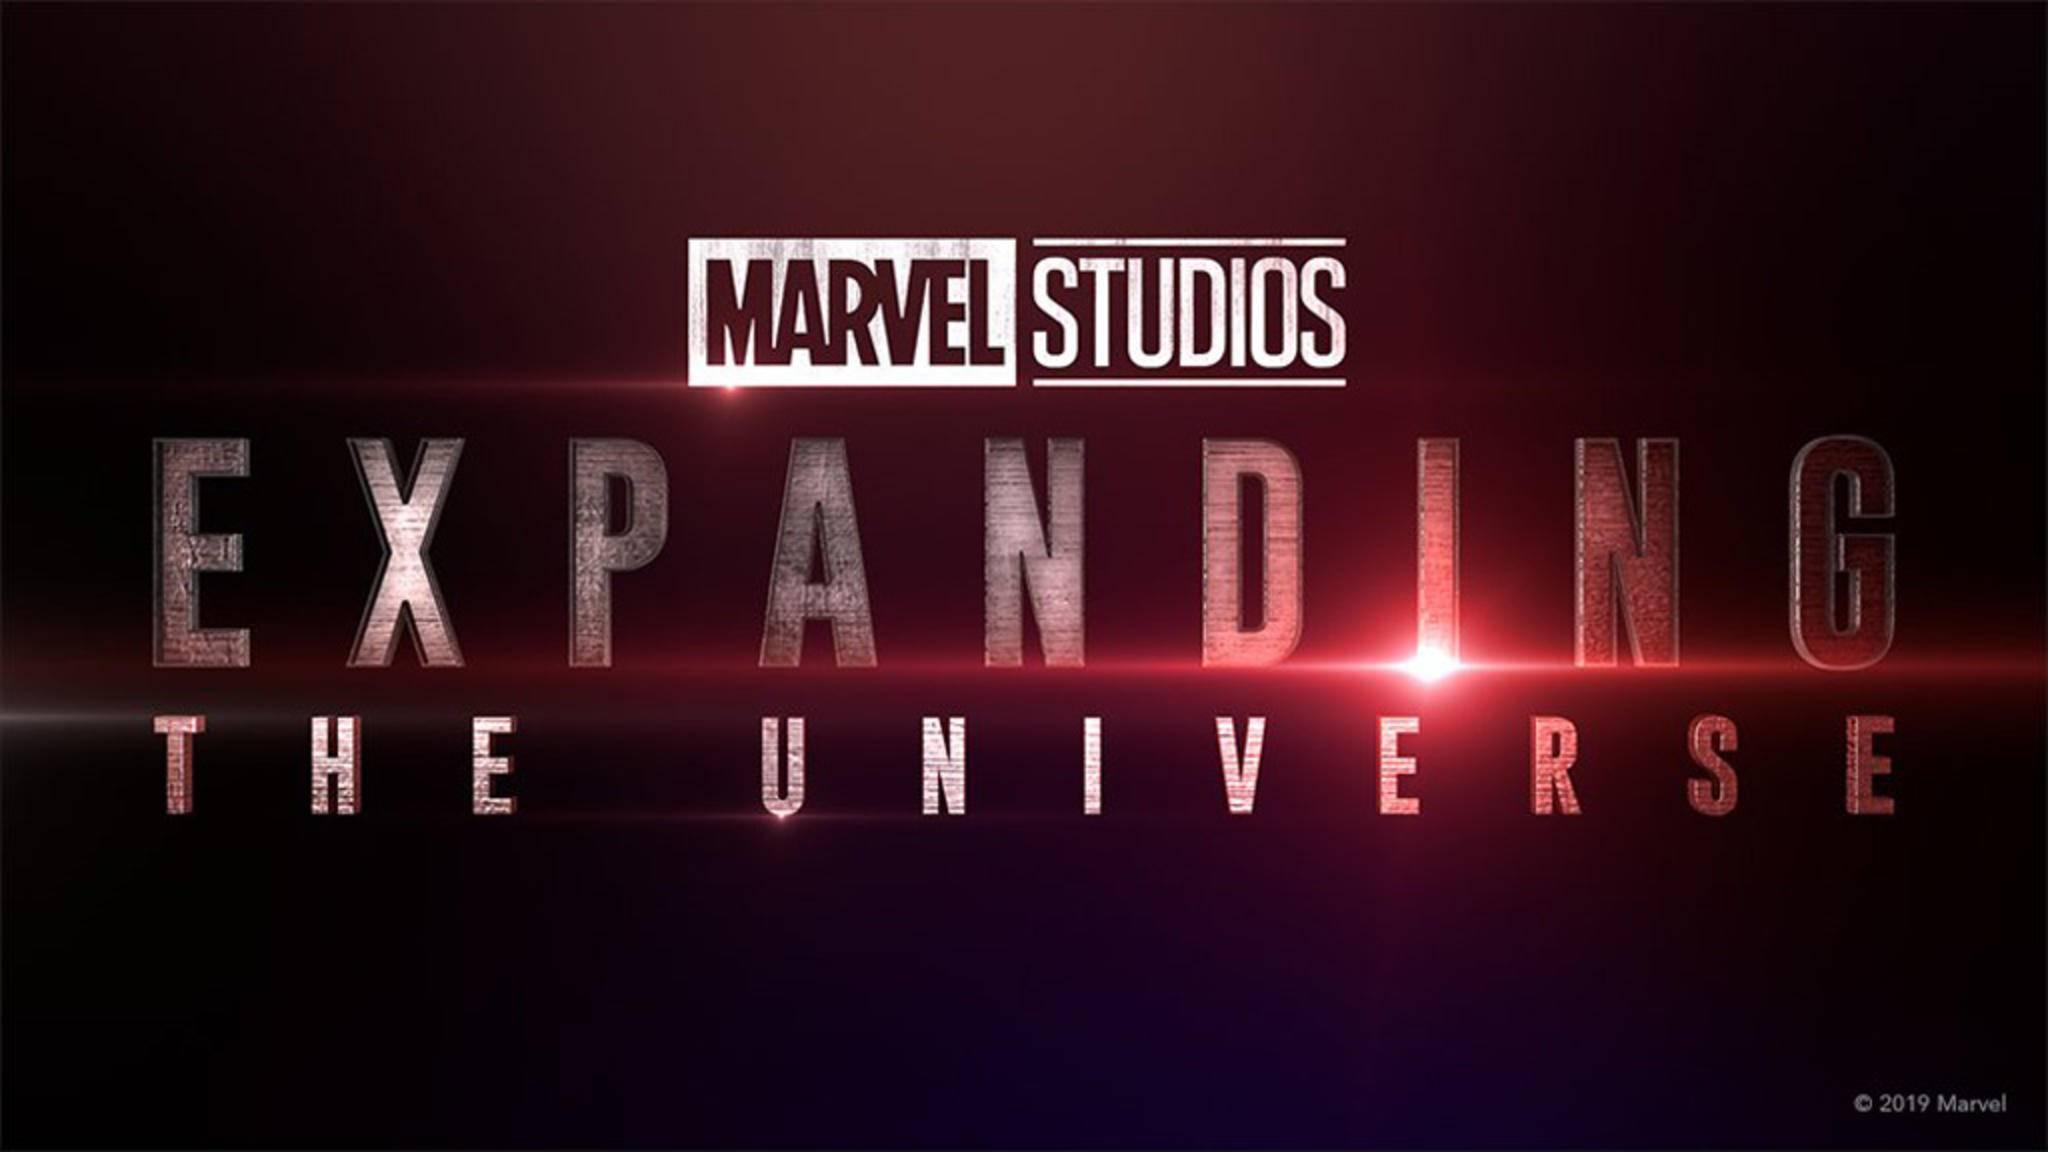 Marvel Studios Expanding the Universe